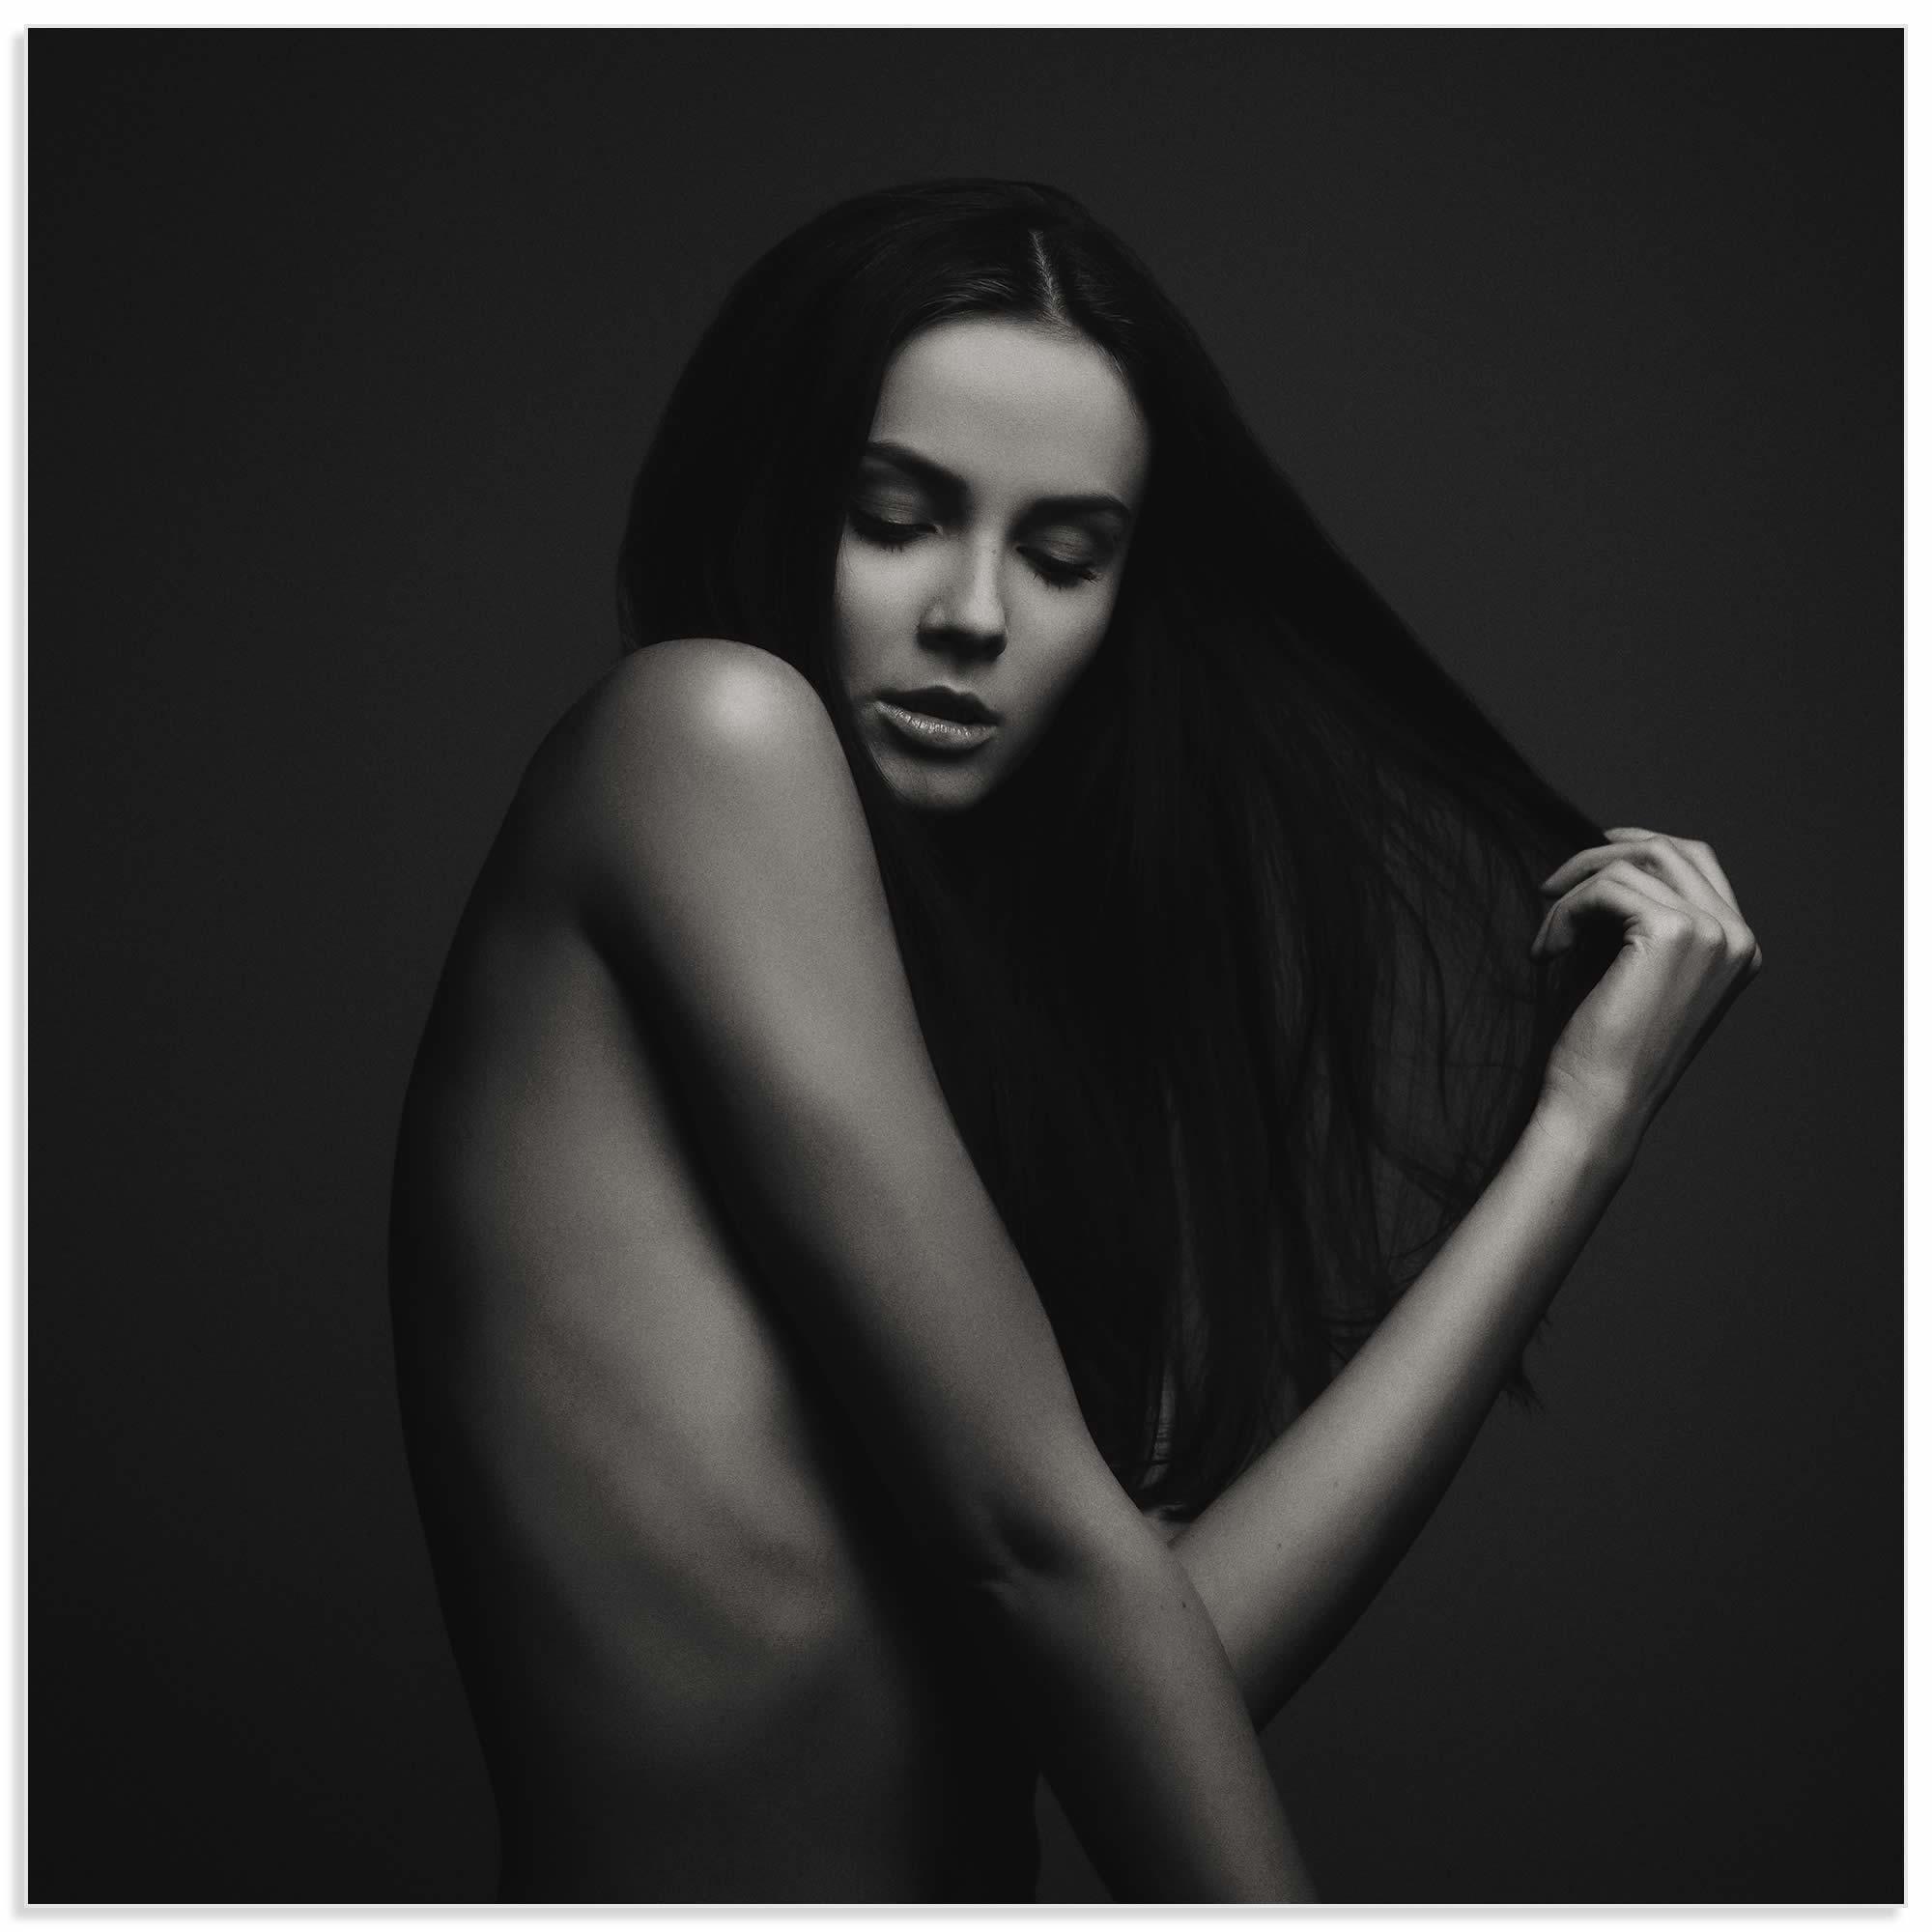 Miriama by Martin Krystynek - Model Photography on Acrylic 581b4896e2246111ce63aaf9